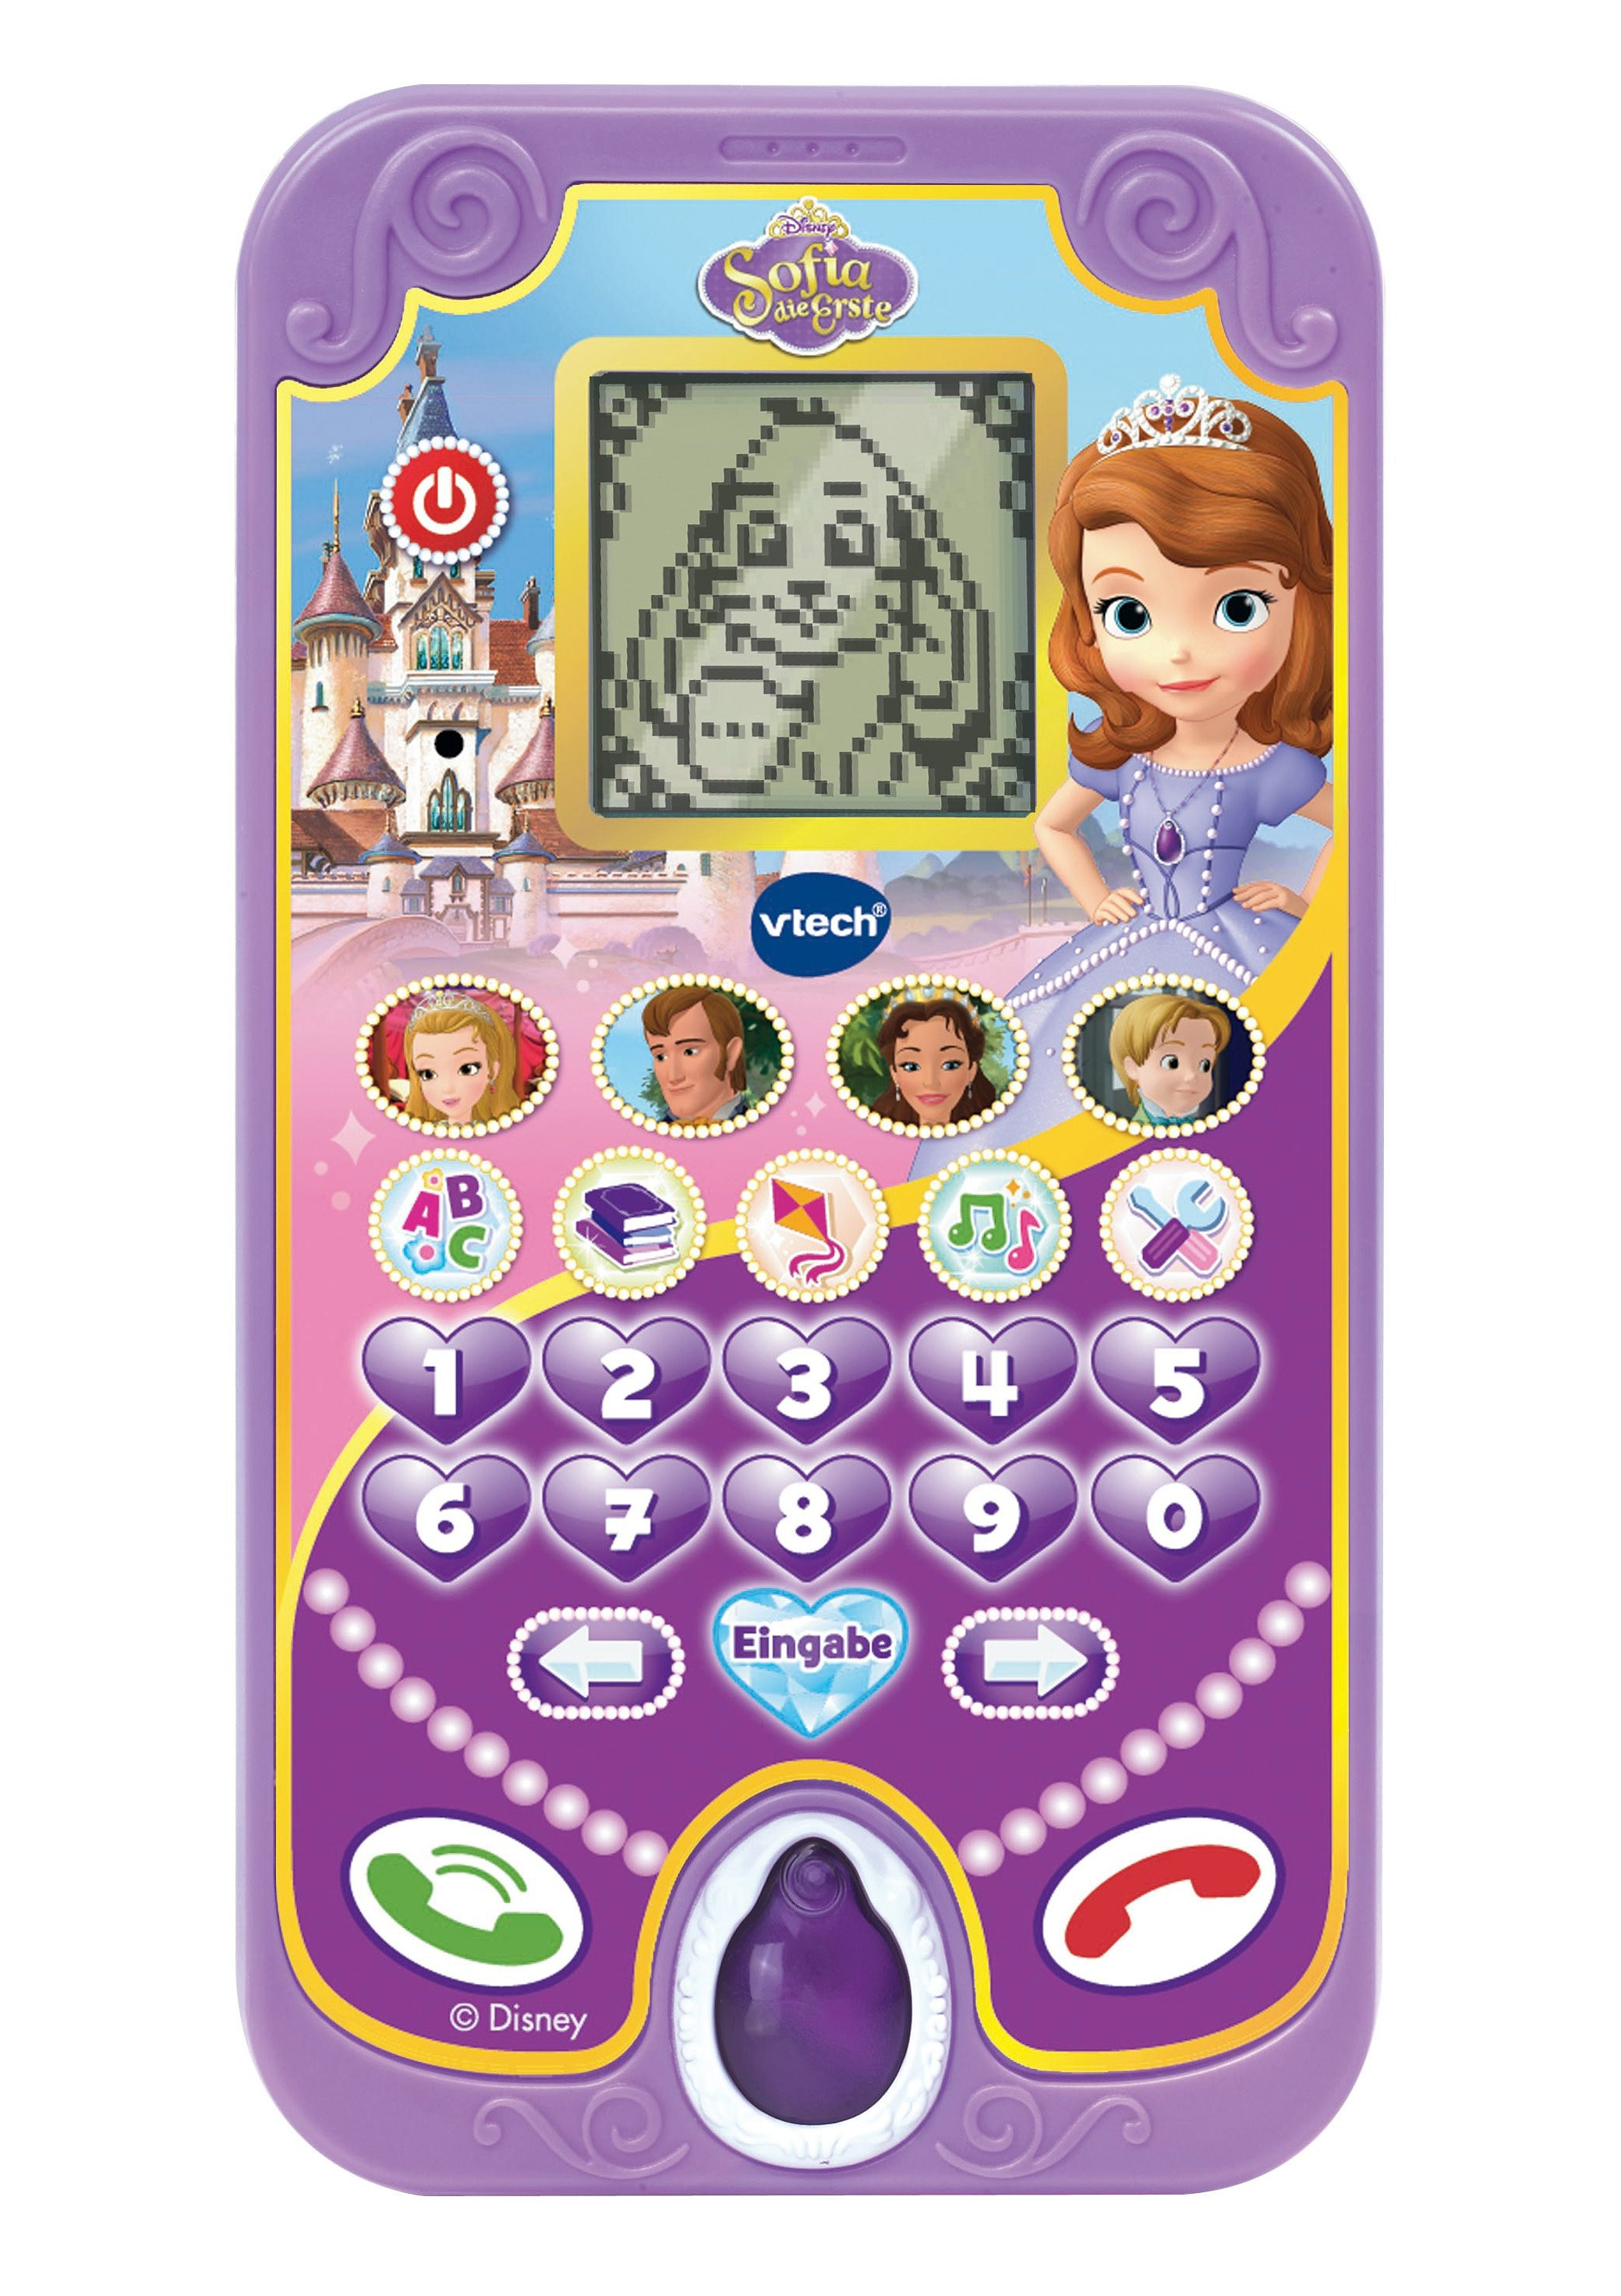 VTech Kinder-Smartphone, »Sofias Smartphone«